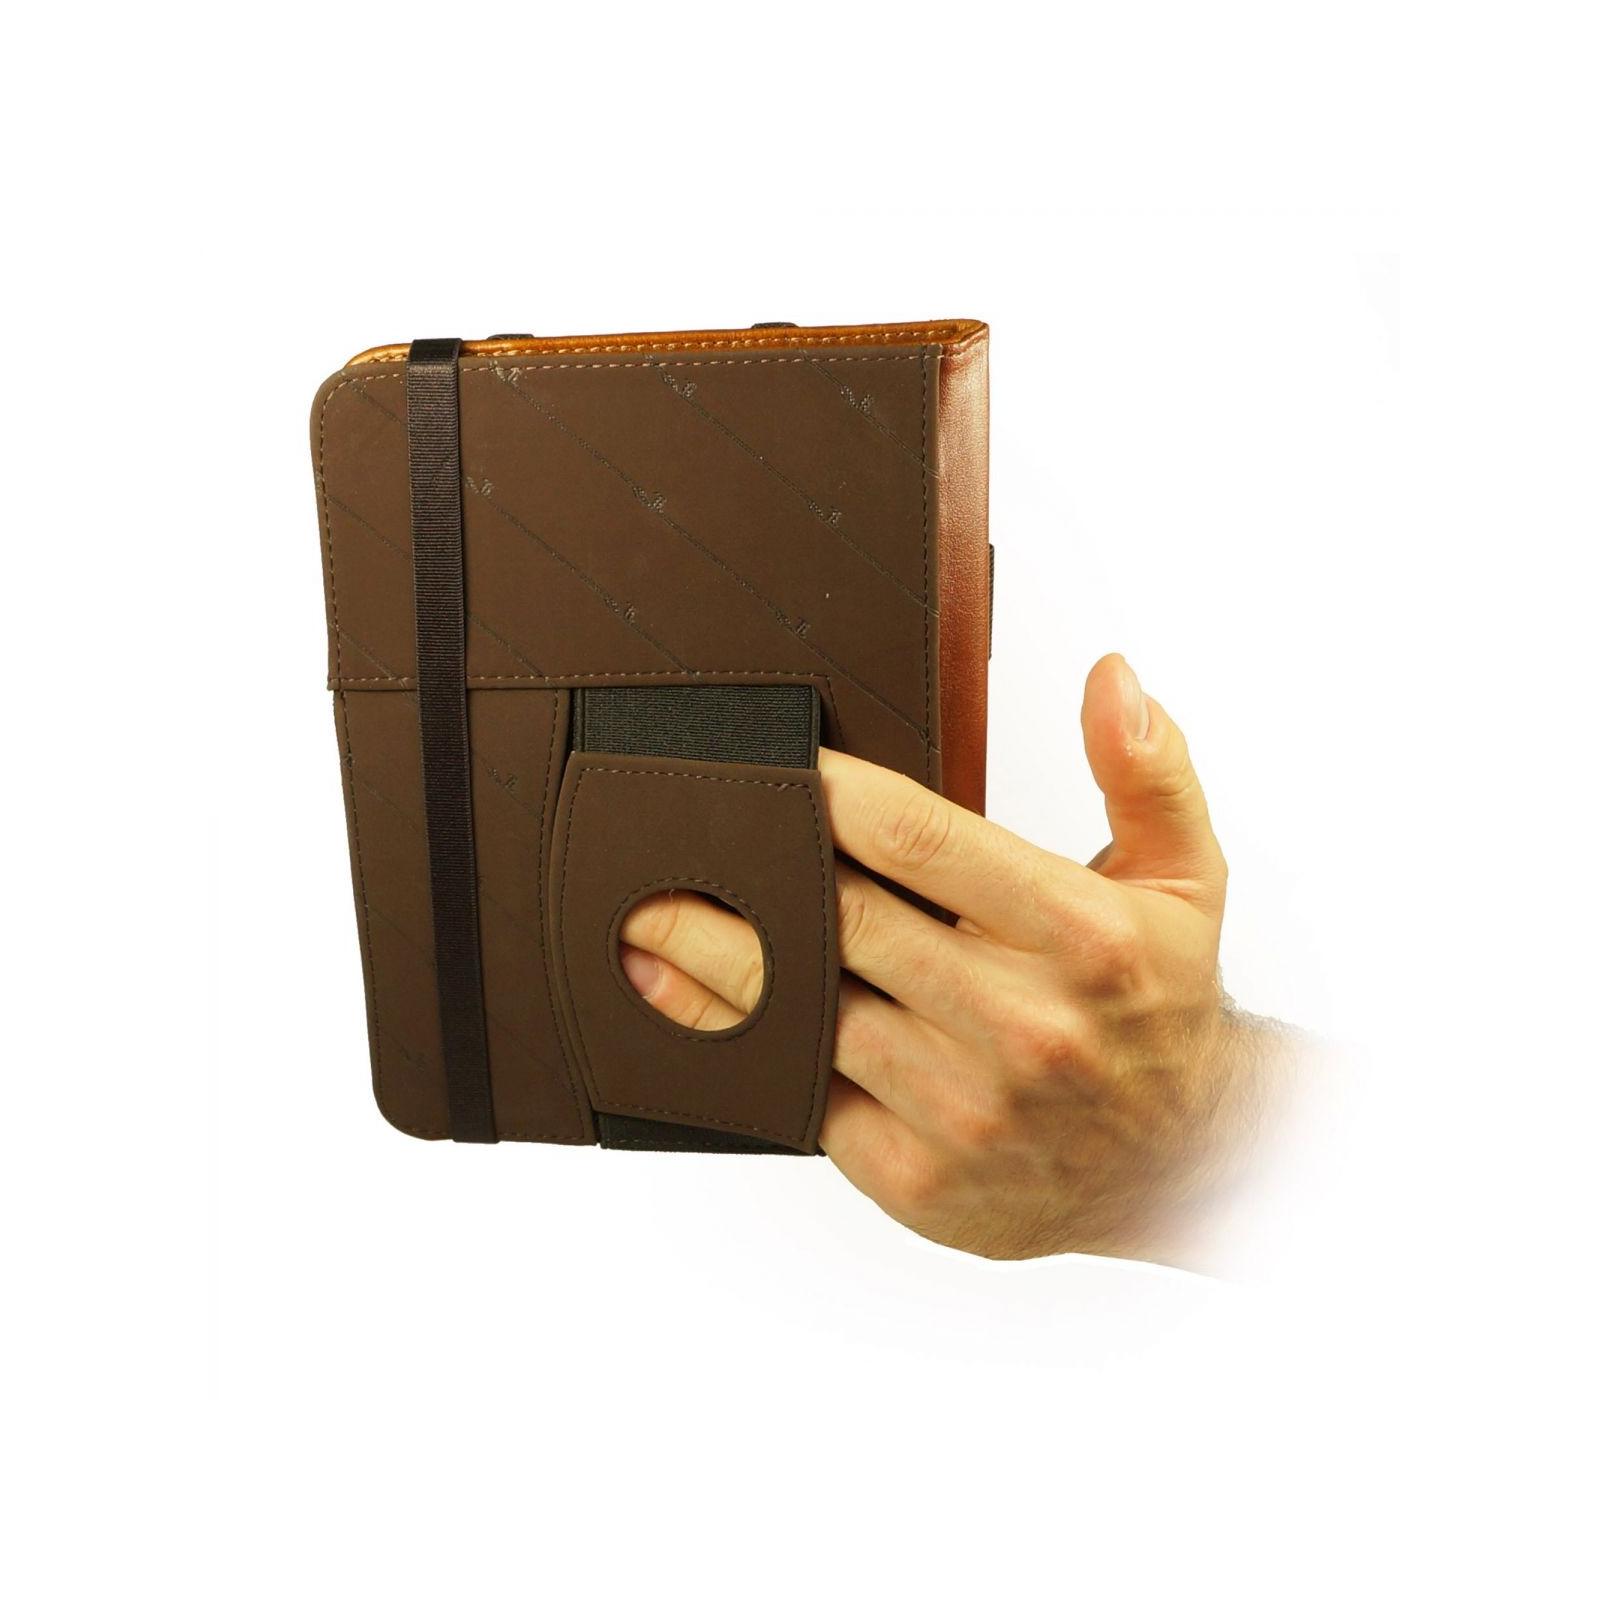 Чехол для электронной книги Tuff-Luv 6 Embrace Plus Leather Vintage Brown (A10_41) изображение 4